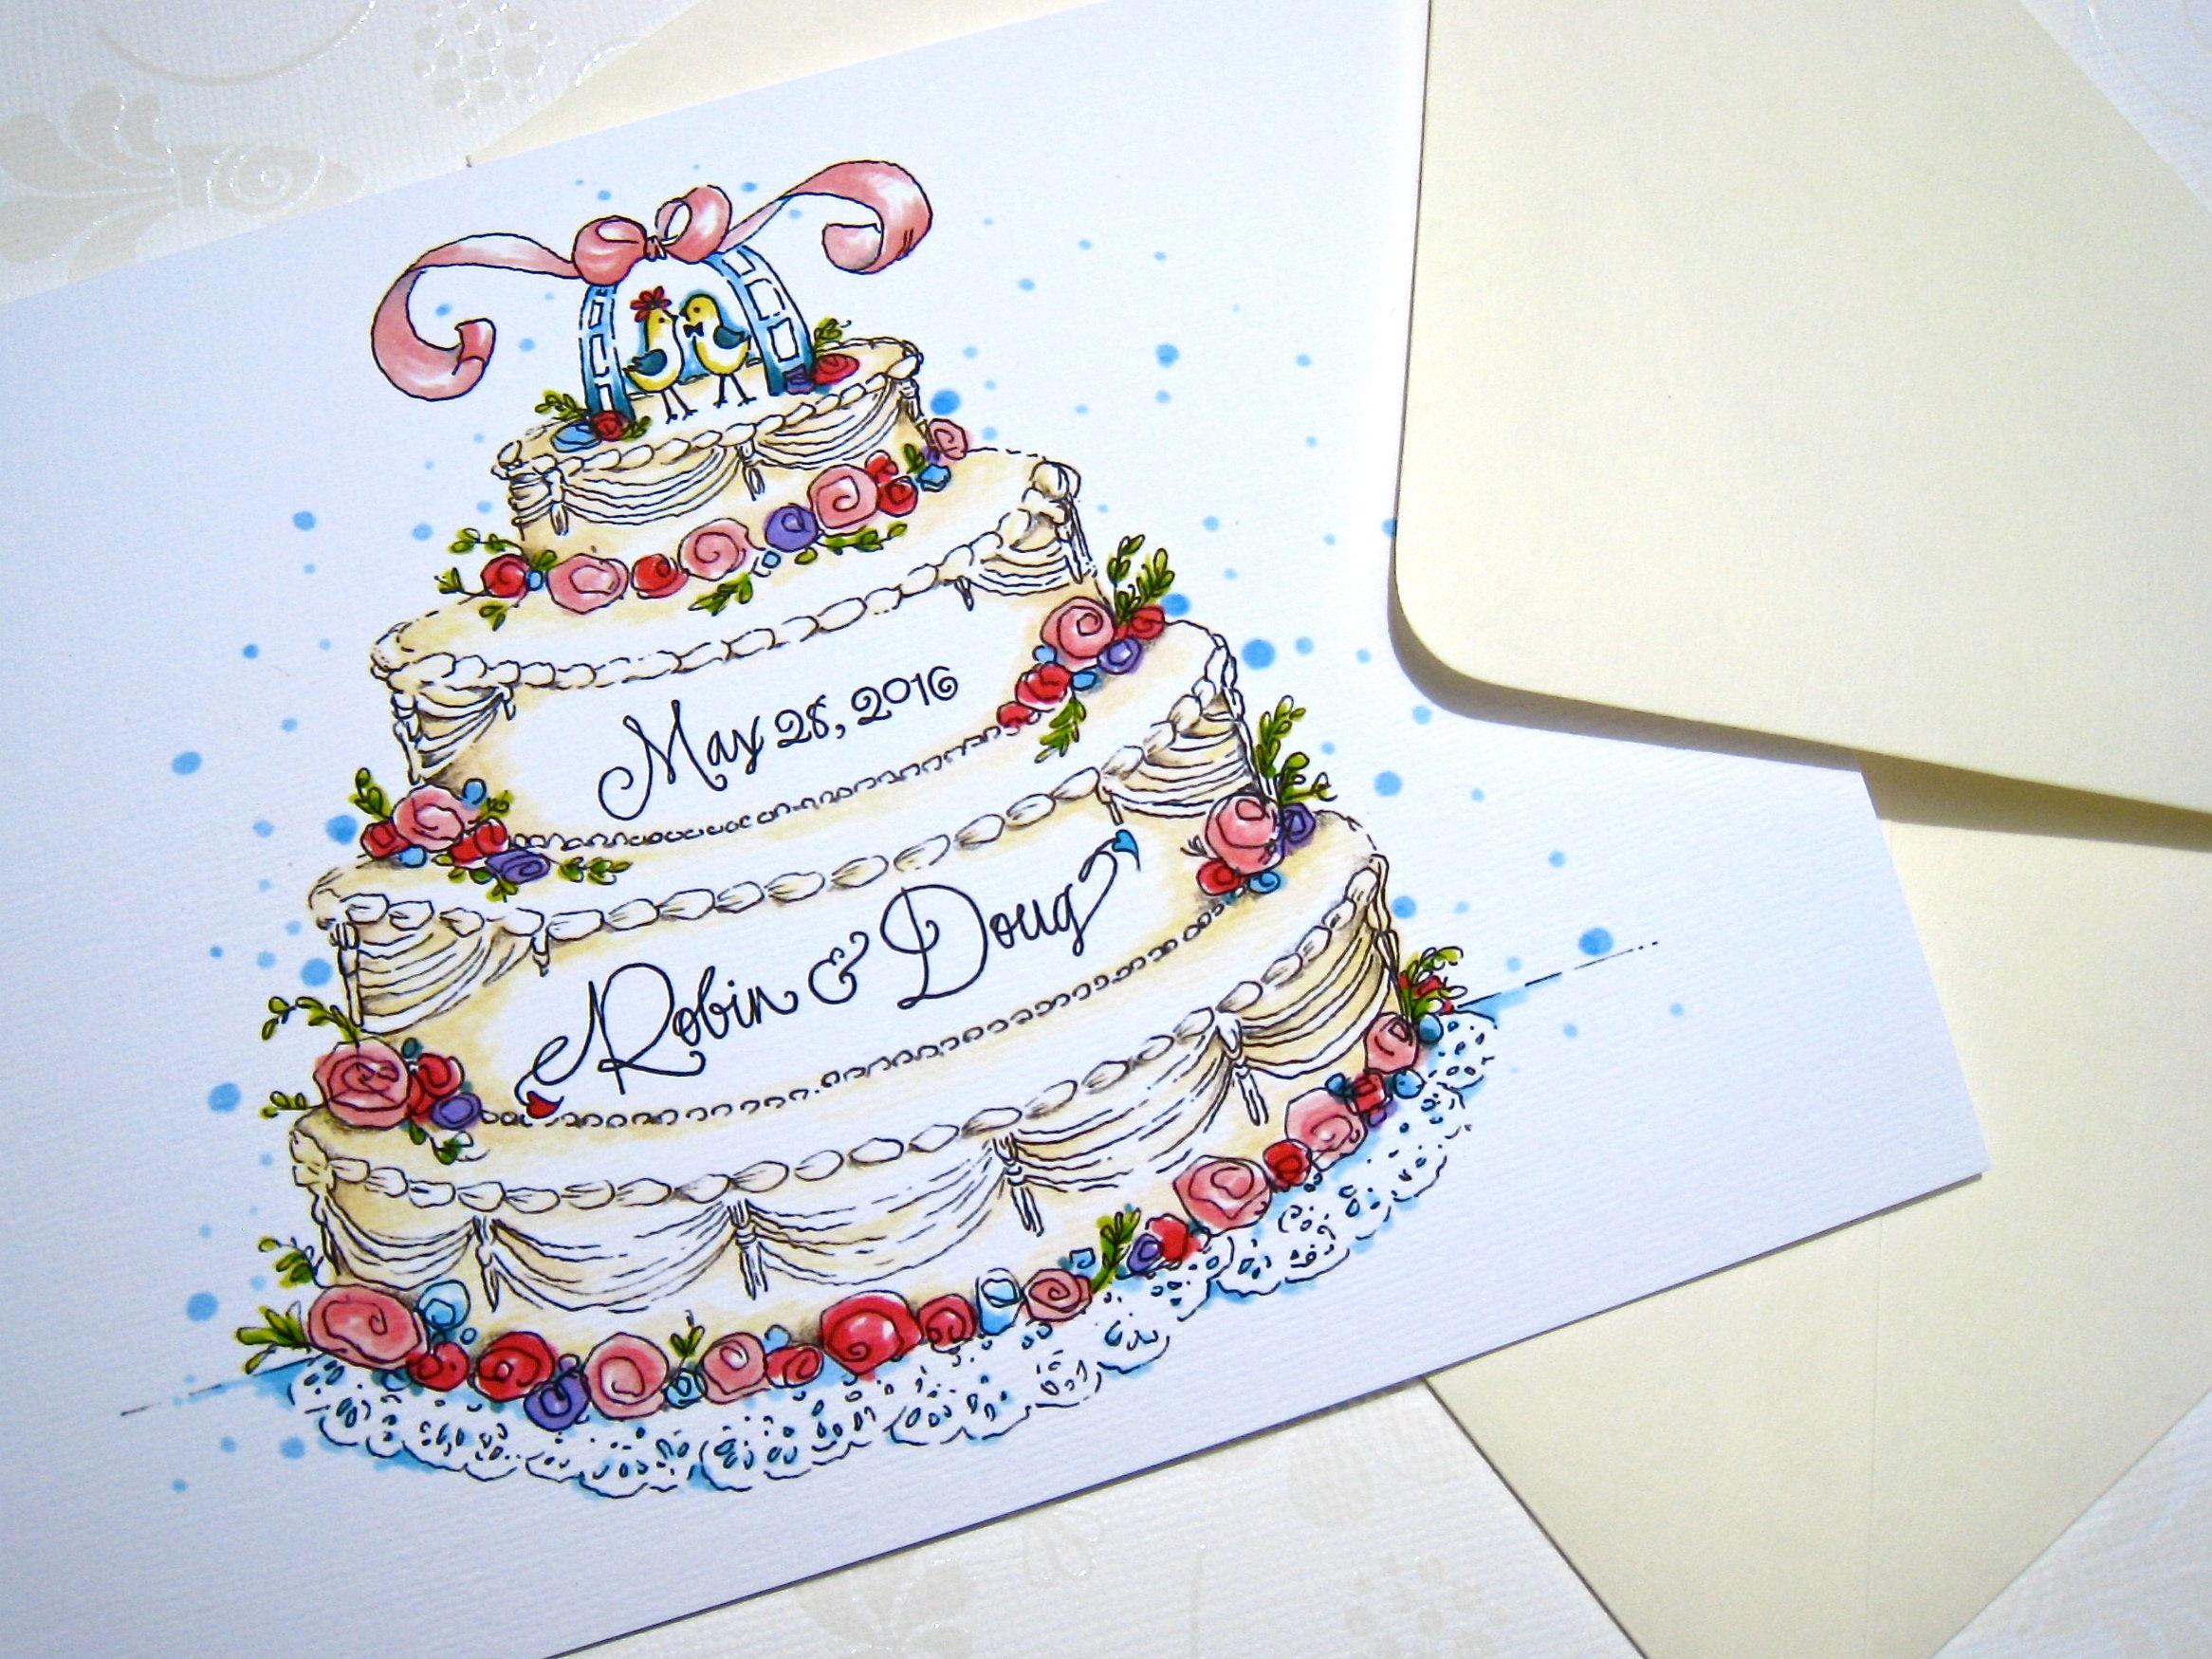 Personalized wedding congratulations card wedding cake